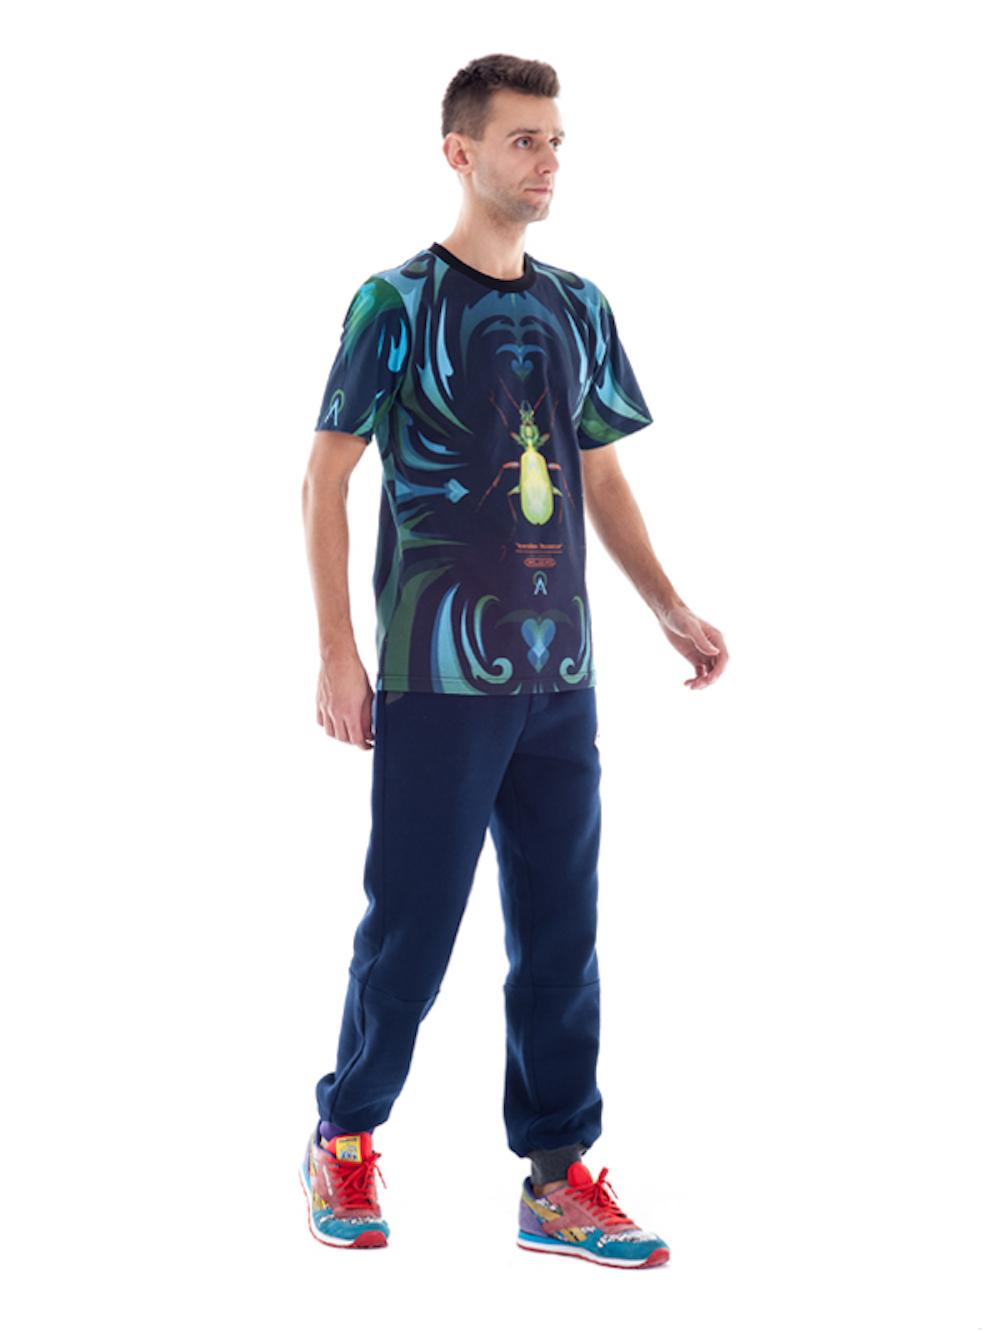 Carabus T-shirt (Dark) - Okuaku